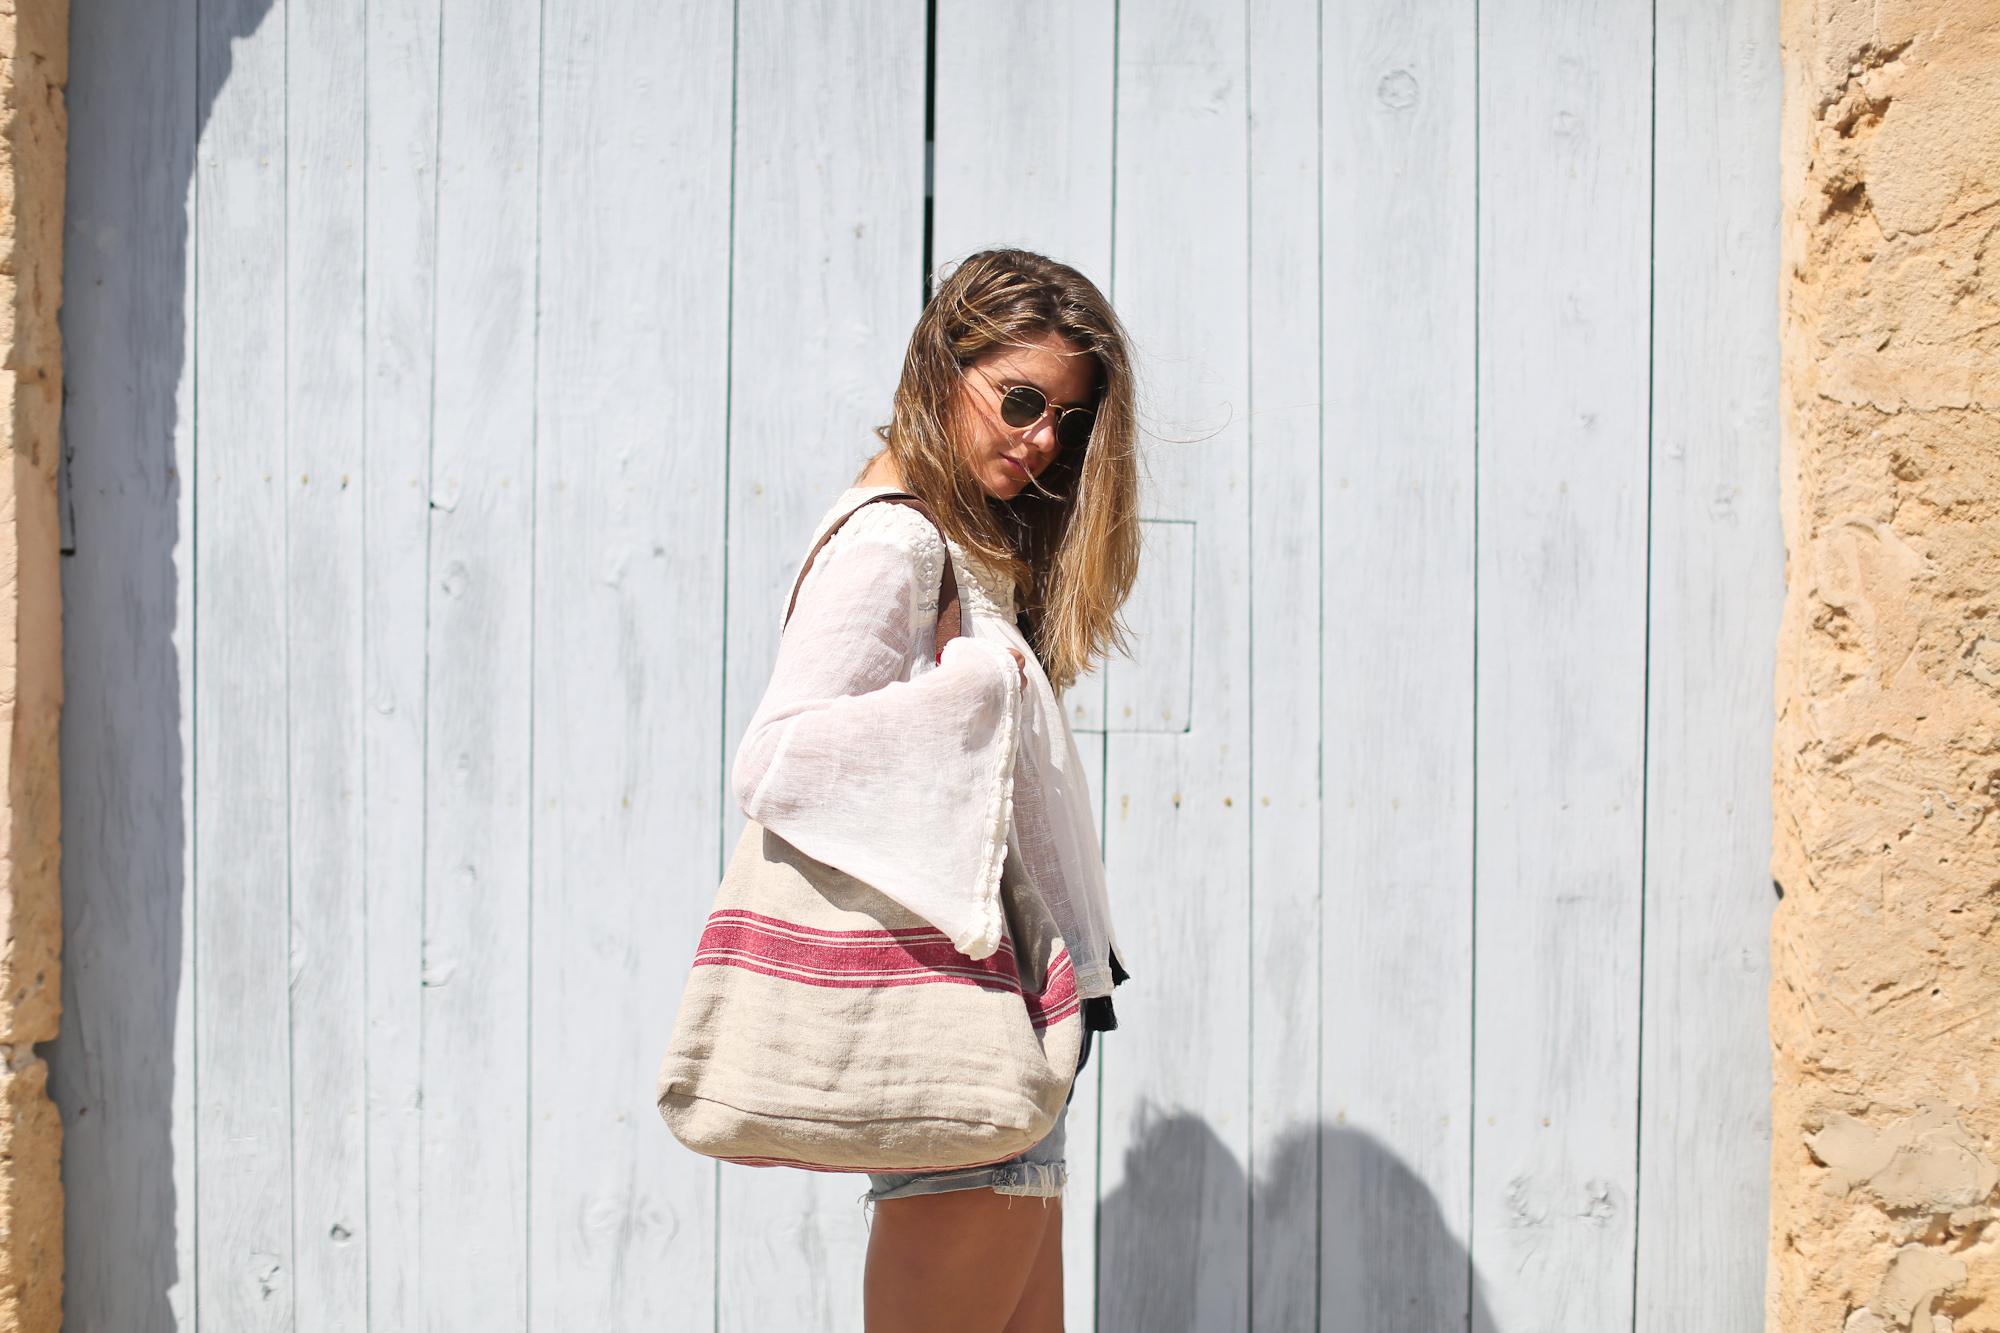 Clochet_streetstyle_zara_embroided_linen_kimonojacket_vintagelevis501shorts-4